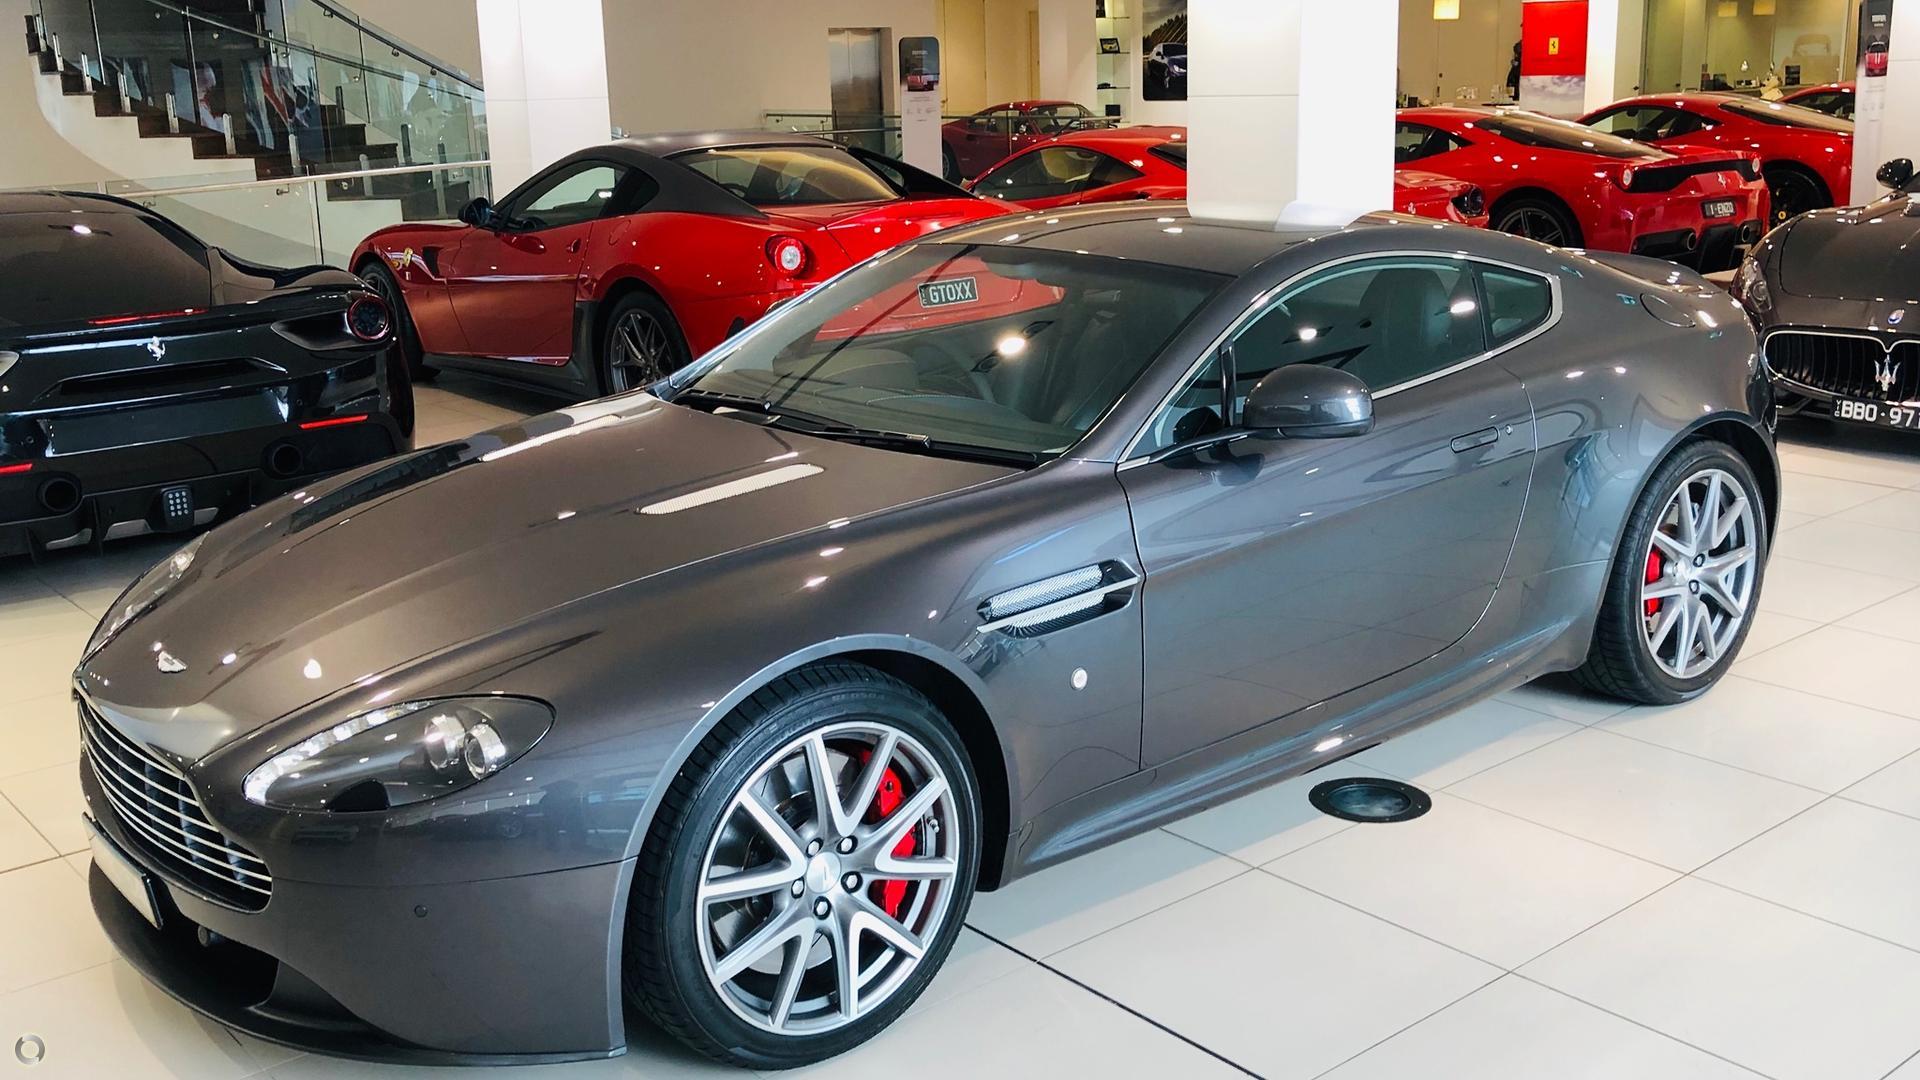 2012 Aston Martin V8 Vantage (No Series)